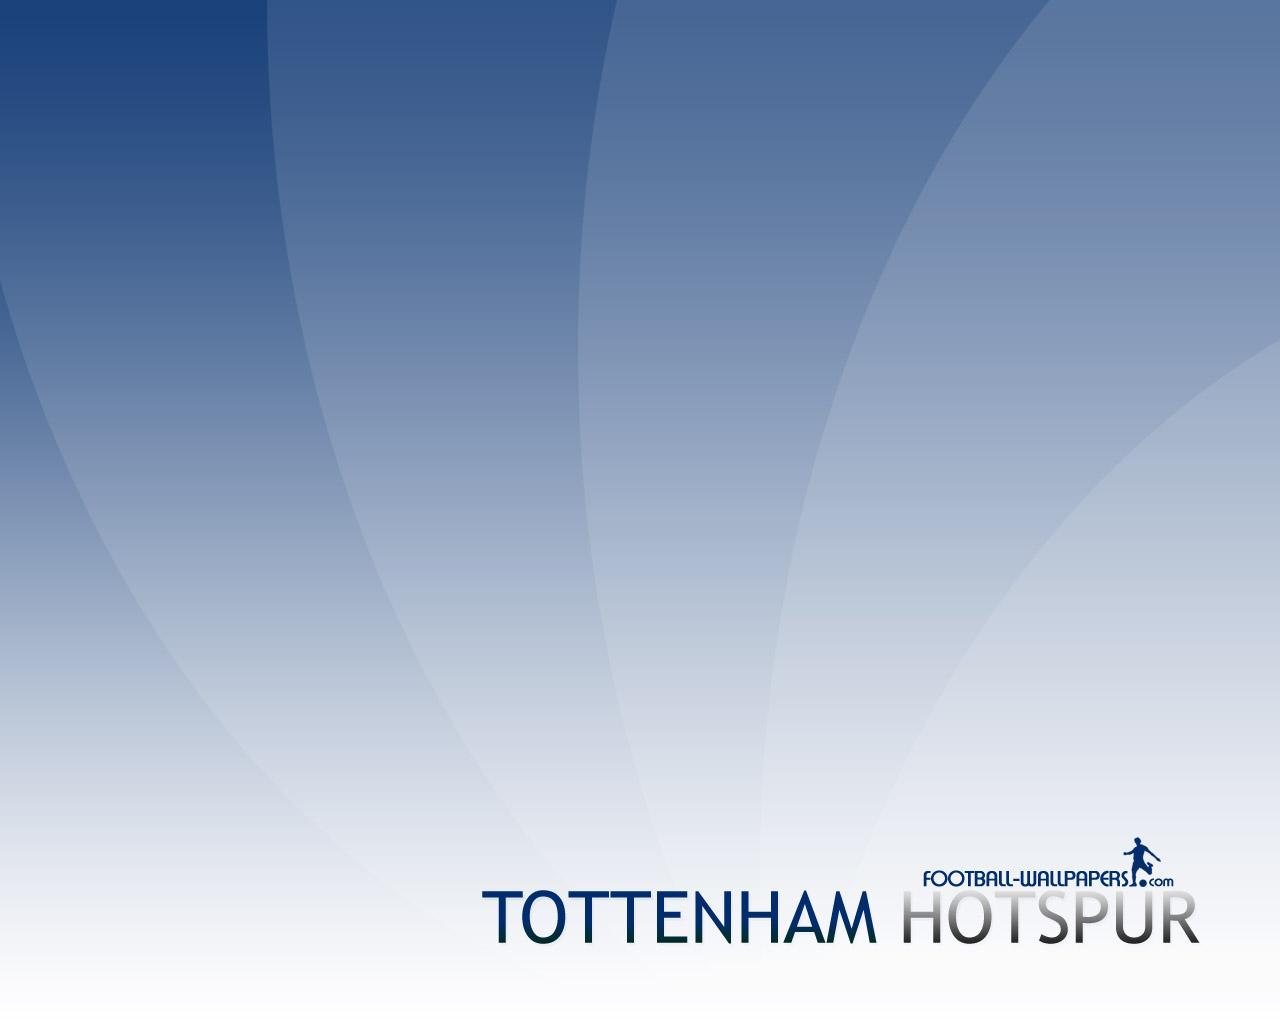 wallpaper free picture: Tottenham Hotspur Wallpaper